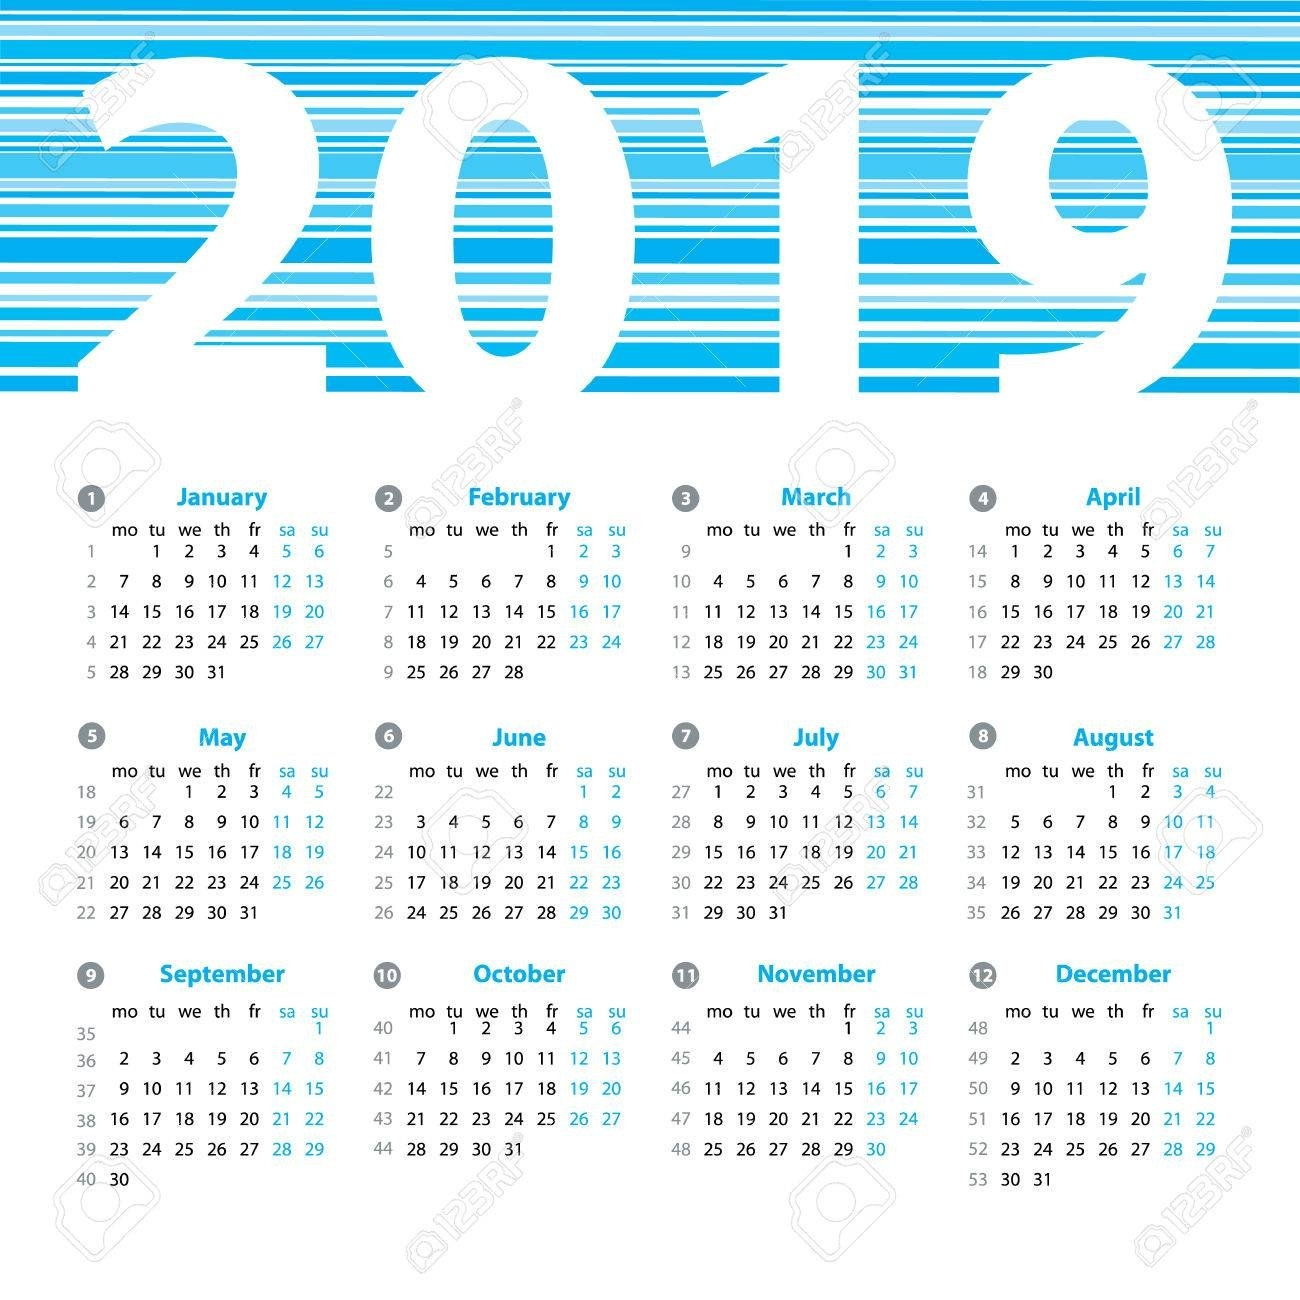 Calendar 2019 Year Vector Design Template With Week Numbers And Calendar Week 7 2019